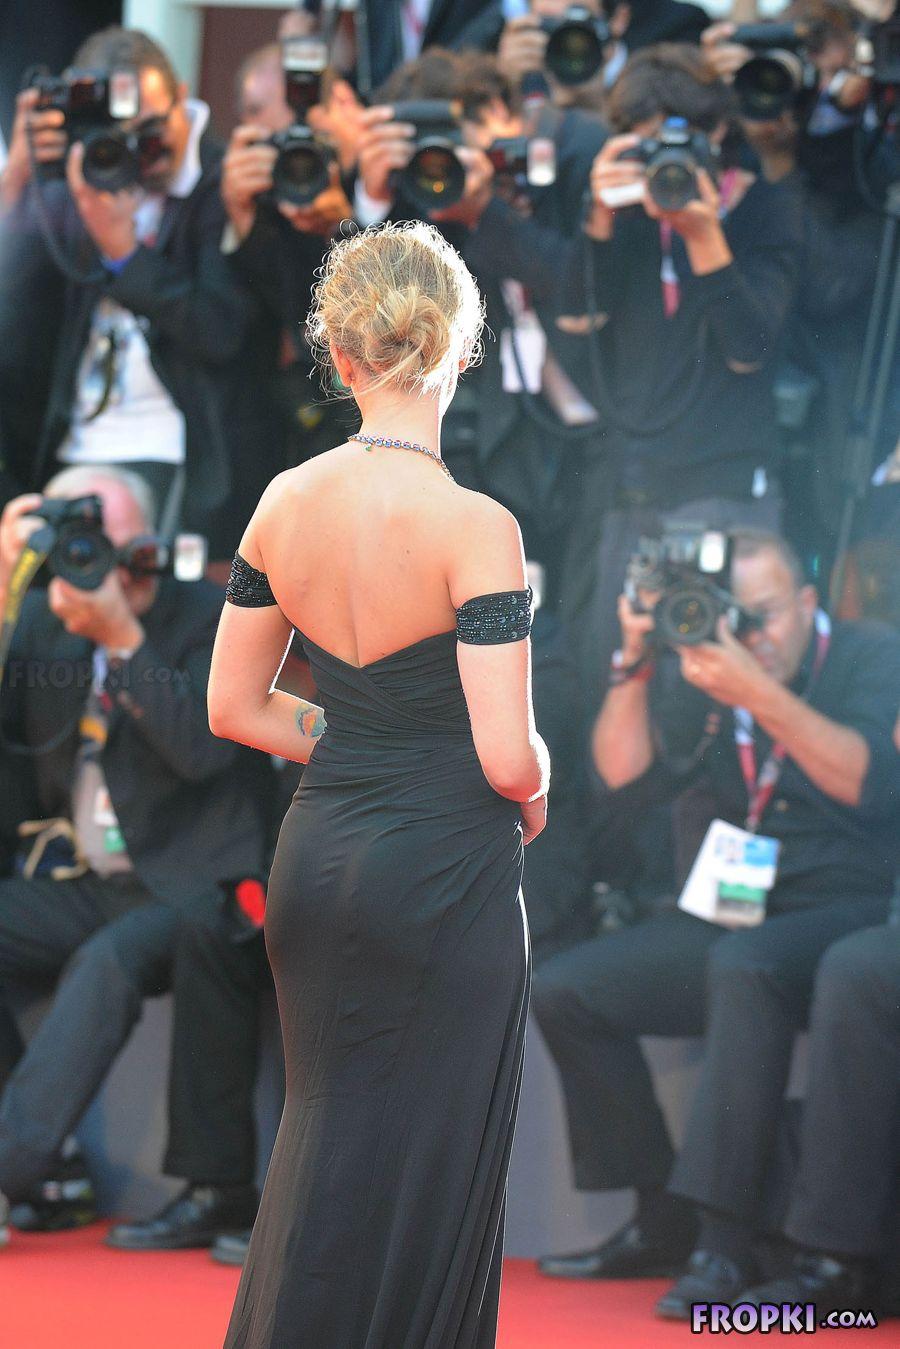 Scarlett Johansson Fropki 27